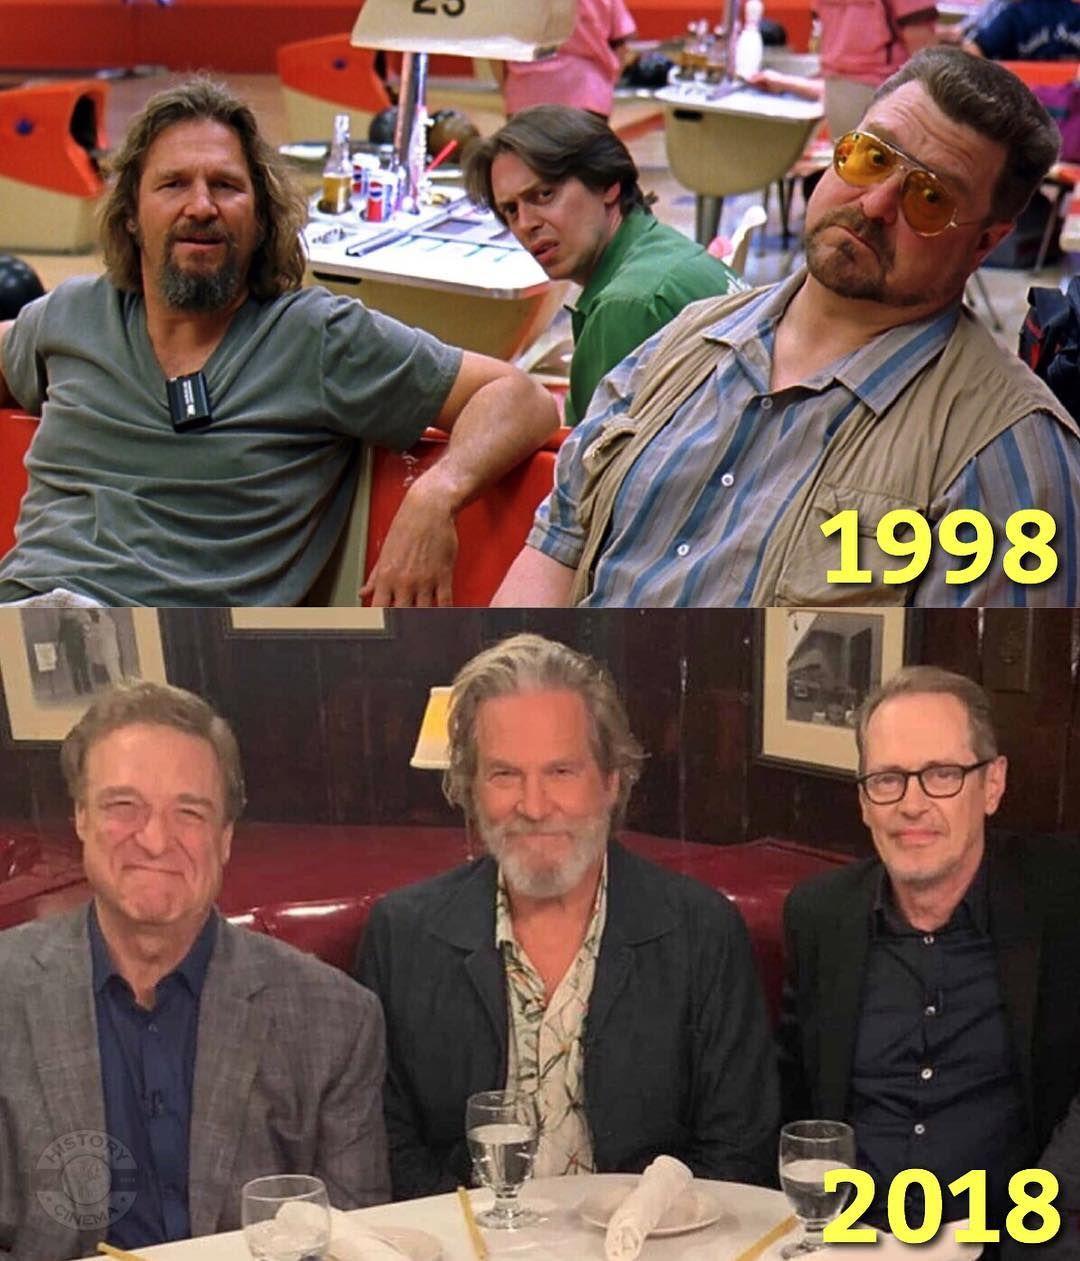 History Of Cinema On Instagram Jeff Bridges John Goodman And Steve Buscemi Reunited After 20 Years Si The Big Lebowski Big Lebowski Quotes Big Lebowski Meme